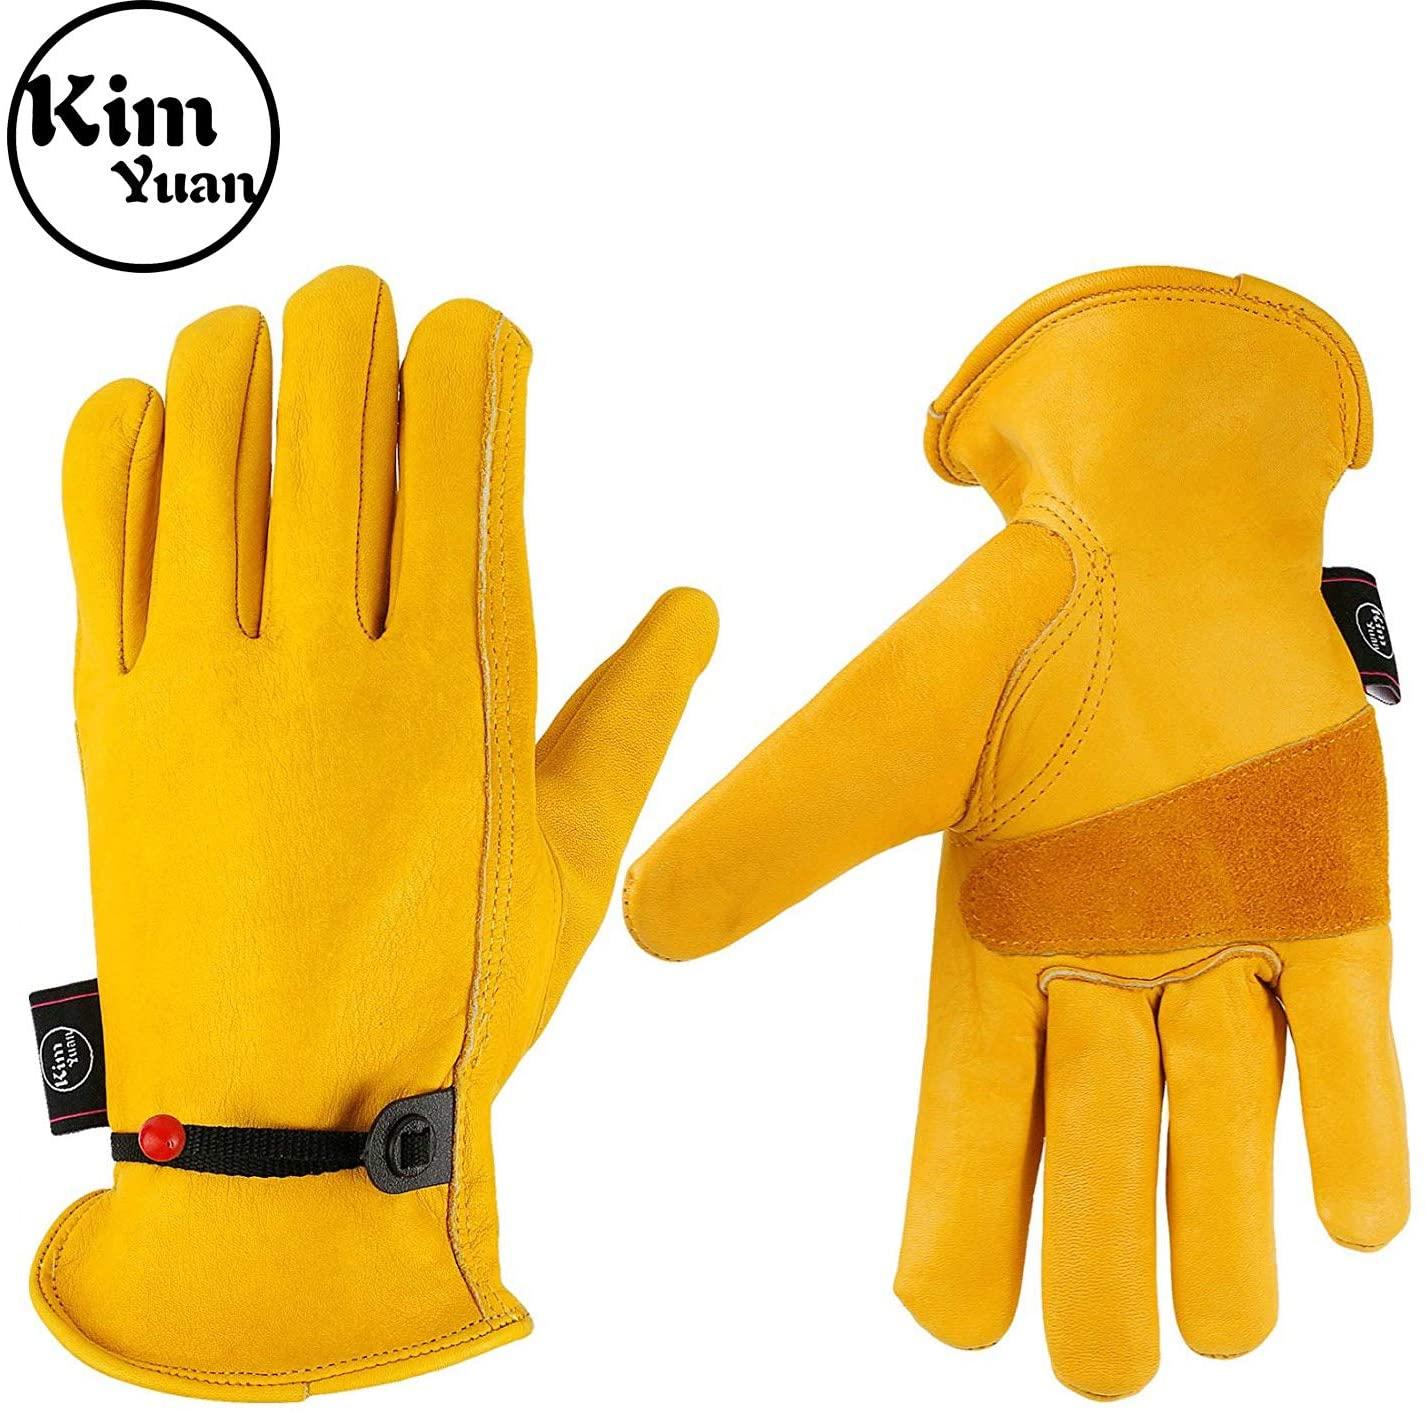 KIM YUAN Leather Work Gloves, with Adjustable Wrist, For Yard Work, Gardening, Farm, Warehouse, Construction, Motorcycle, Men & Women